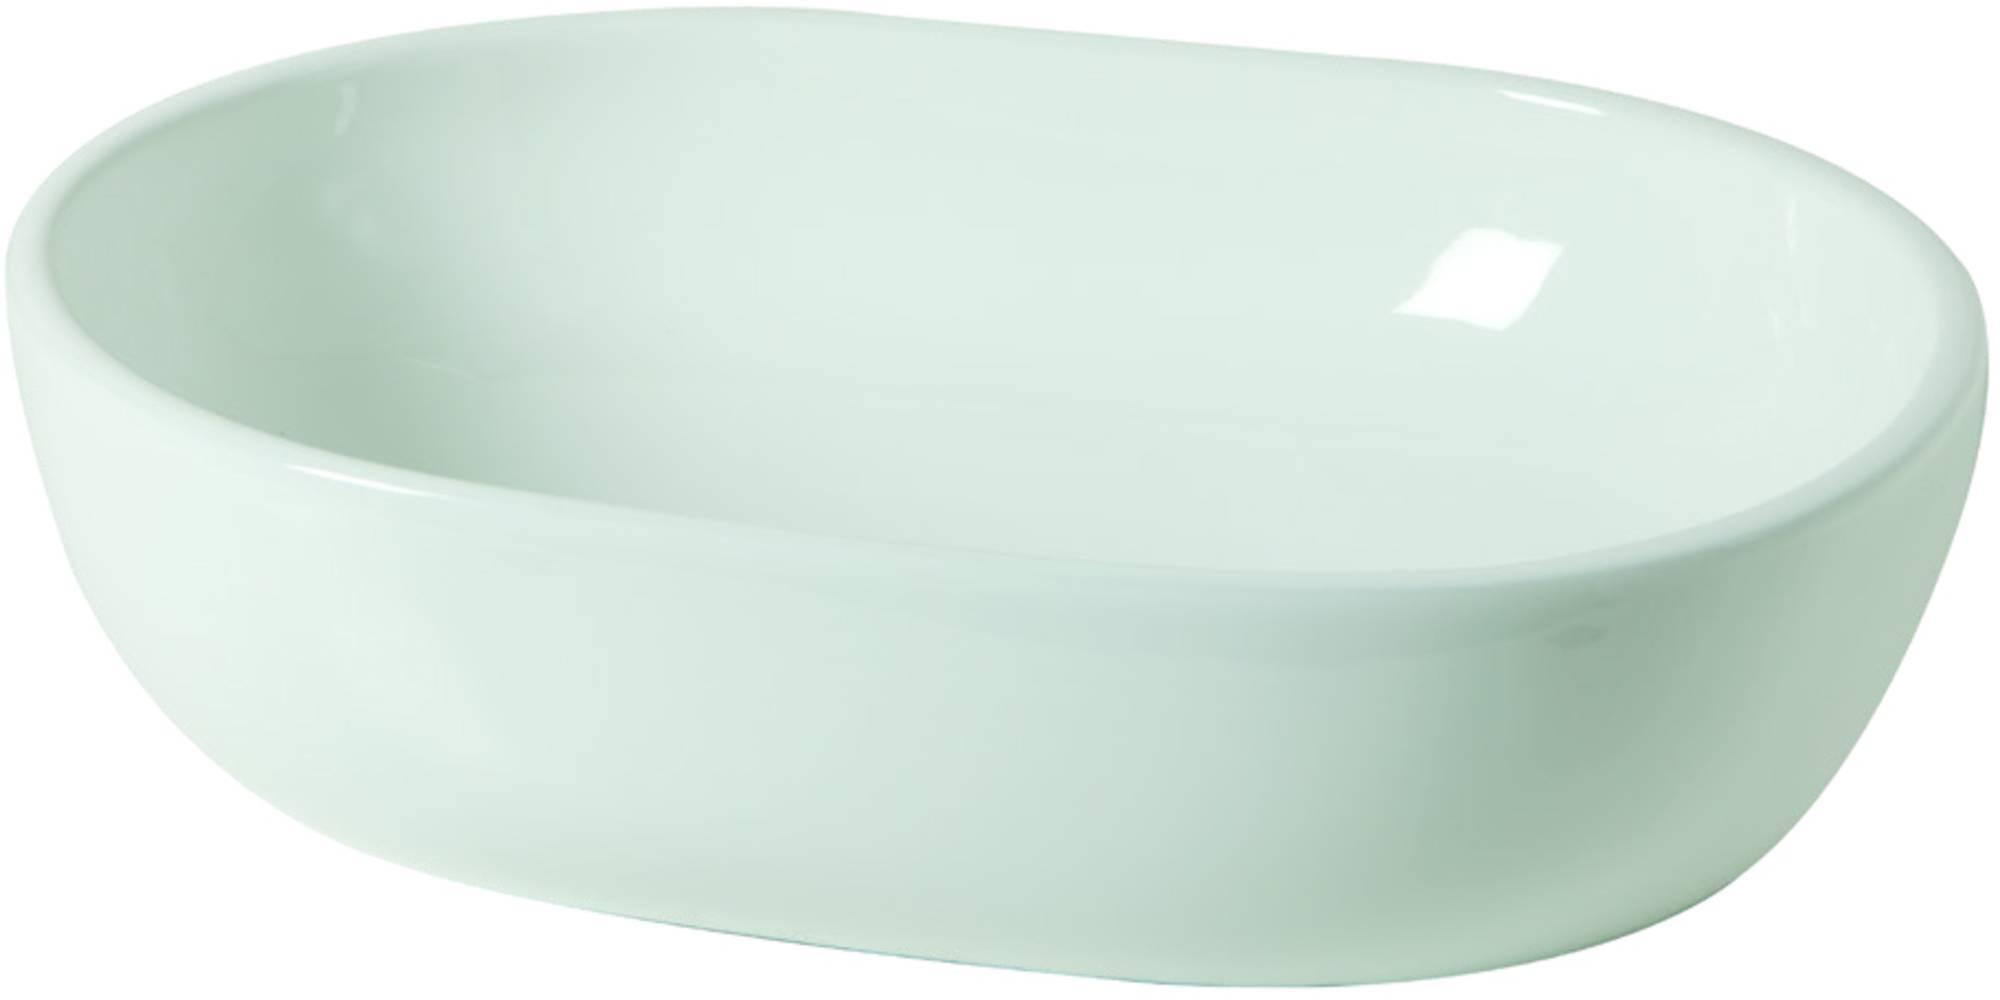 Van Heck Opbouwkom 59x14,5 cm zonder overloop porselein White